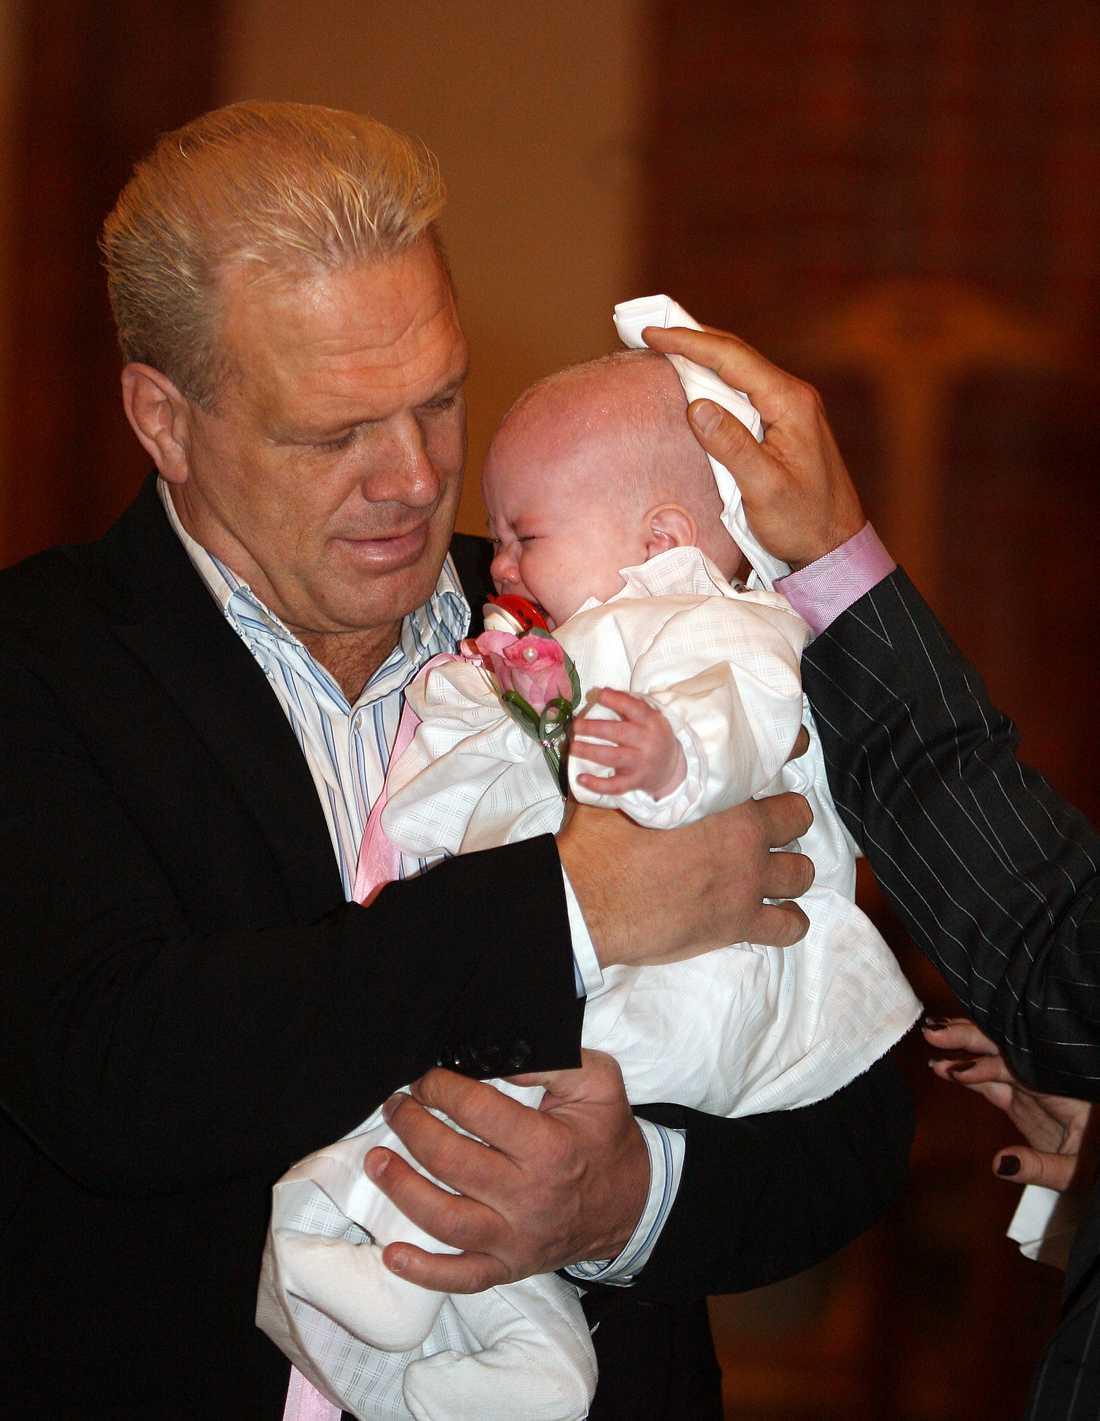 Frank Andersson med dottern Mira under hennes dop i Gustaf Adolfs kyrka i Sundsvall 2006.